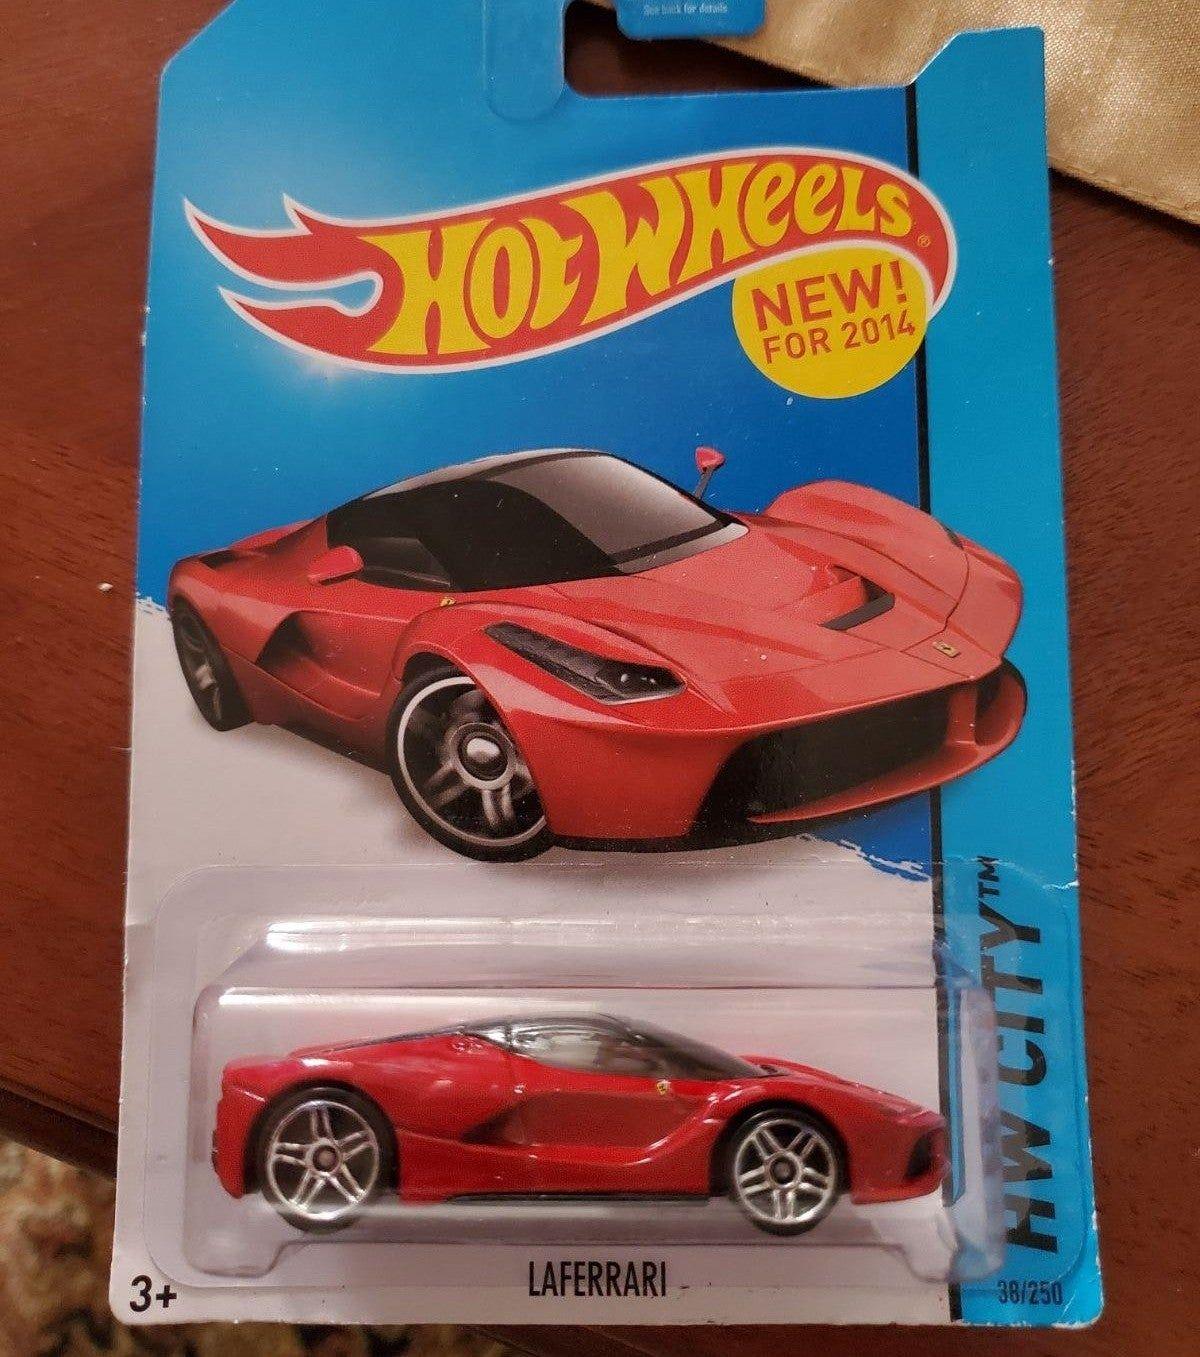 2014 Hot Wheels Ferrari Laferrari New In Card Hot Wheels Doesn T Make Ferrari Anymore Since They Lost The License Ferrari Laferrari Hot Wheels Ferrari